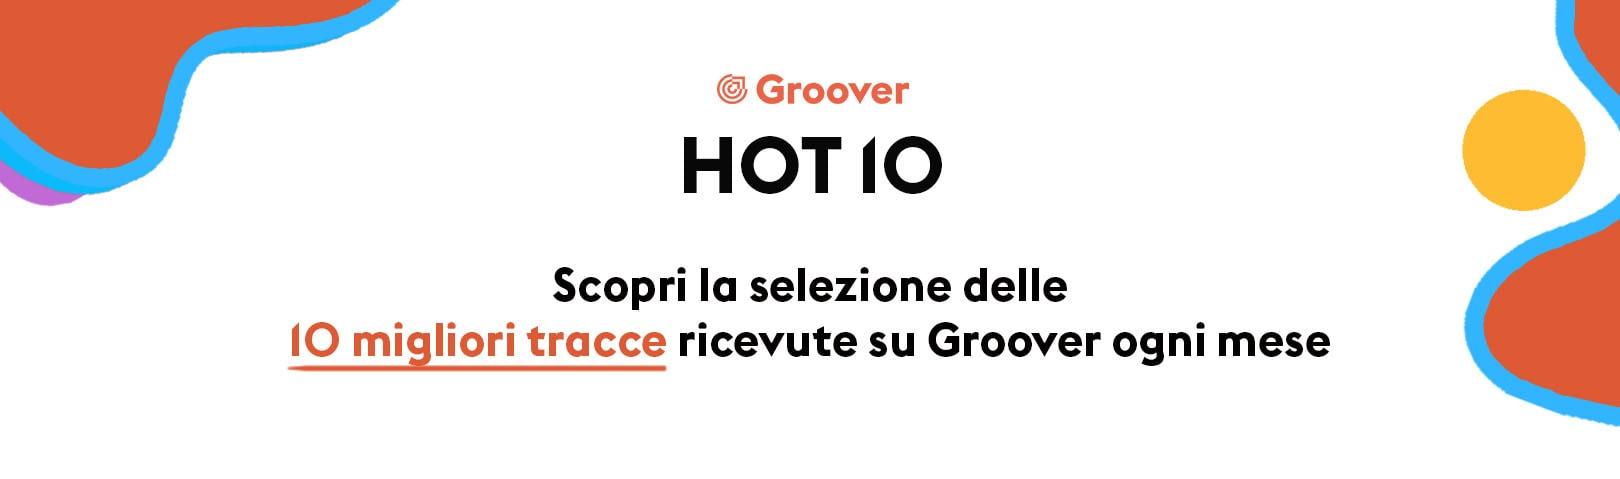 Bandeau Hot 10 - It-min